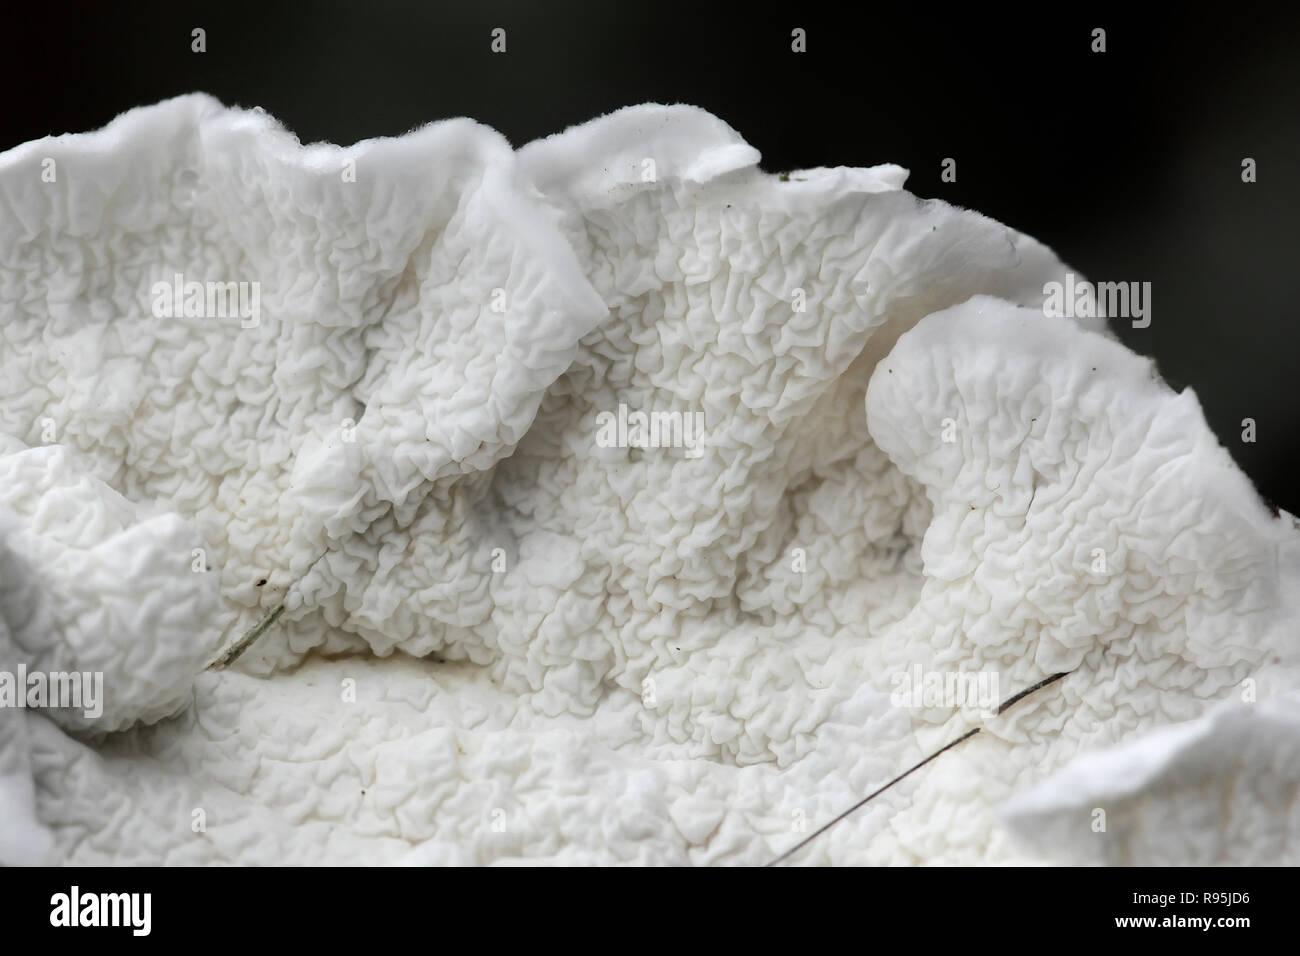 White soft texture of a fungus called Plicatura nivea Stock Photo